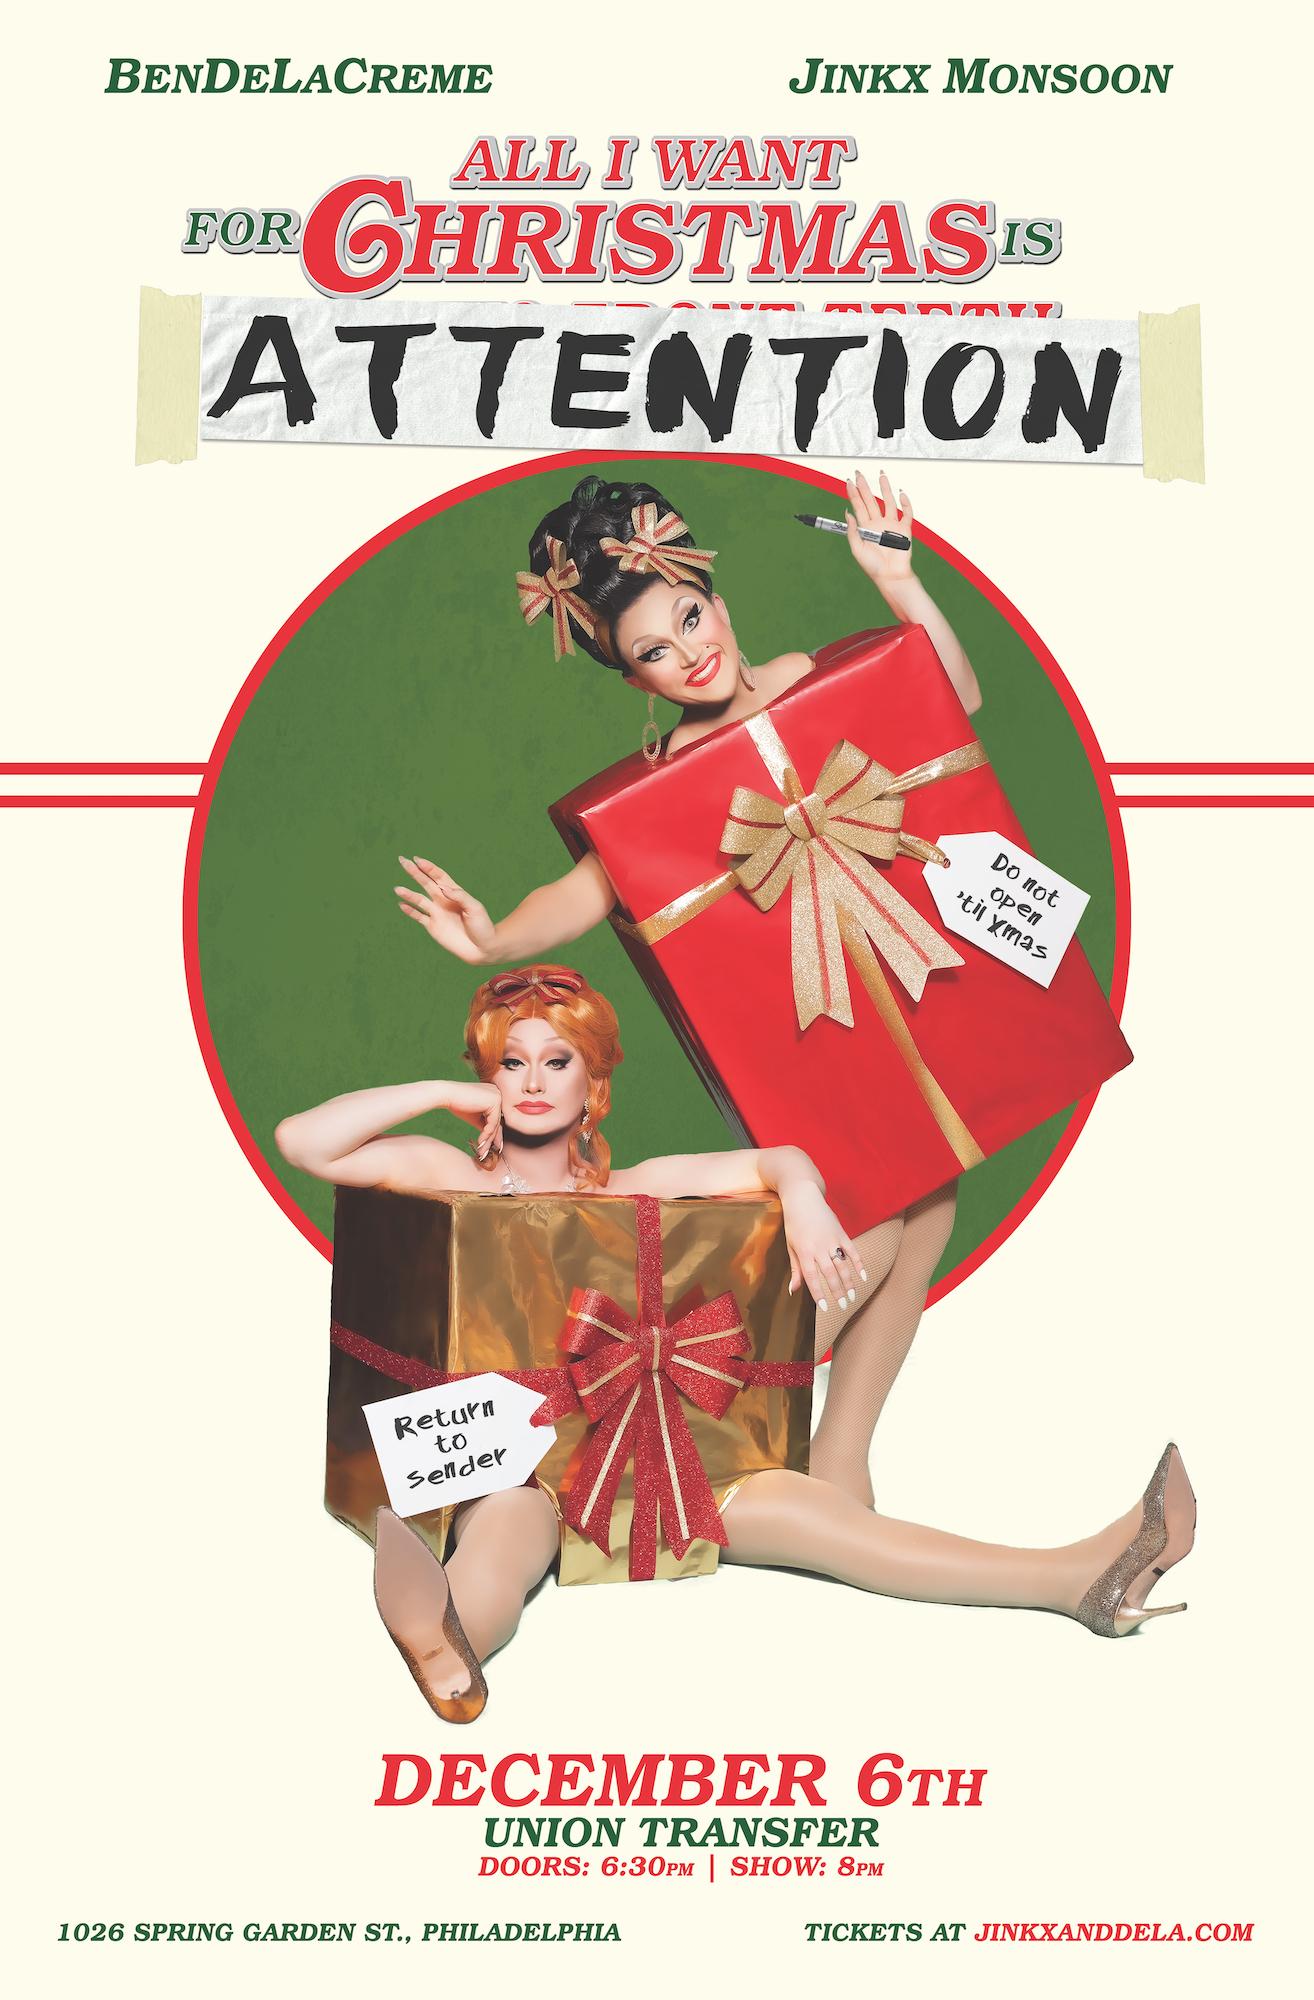 All I Want For Christmas.Bendelacreme Jinkx Monsoon All I Want For Christmas Is Attention Union Transfer